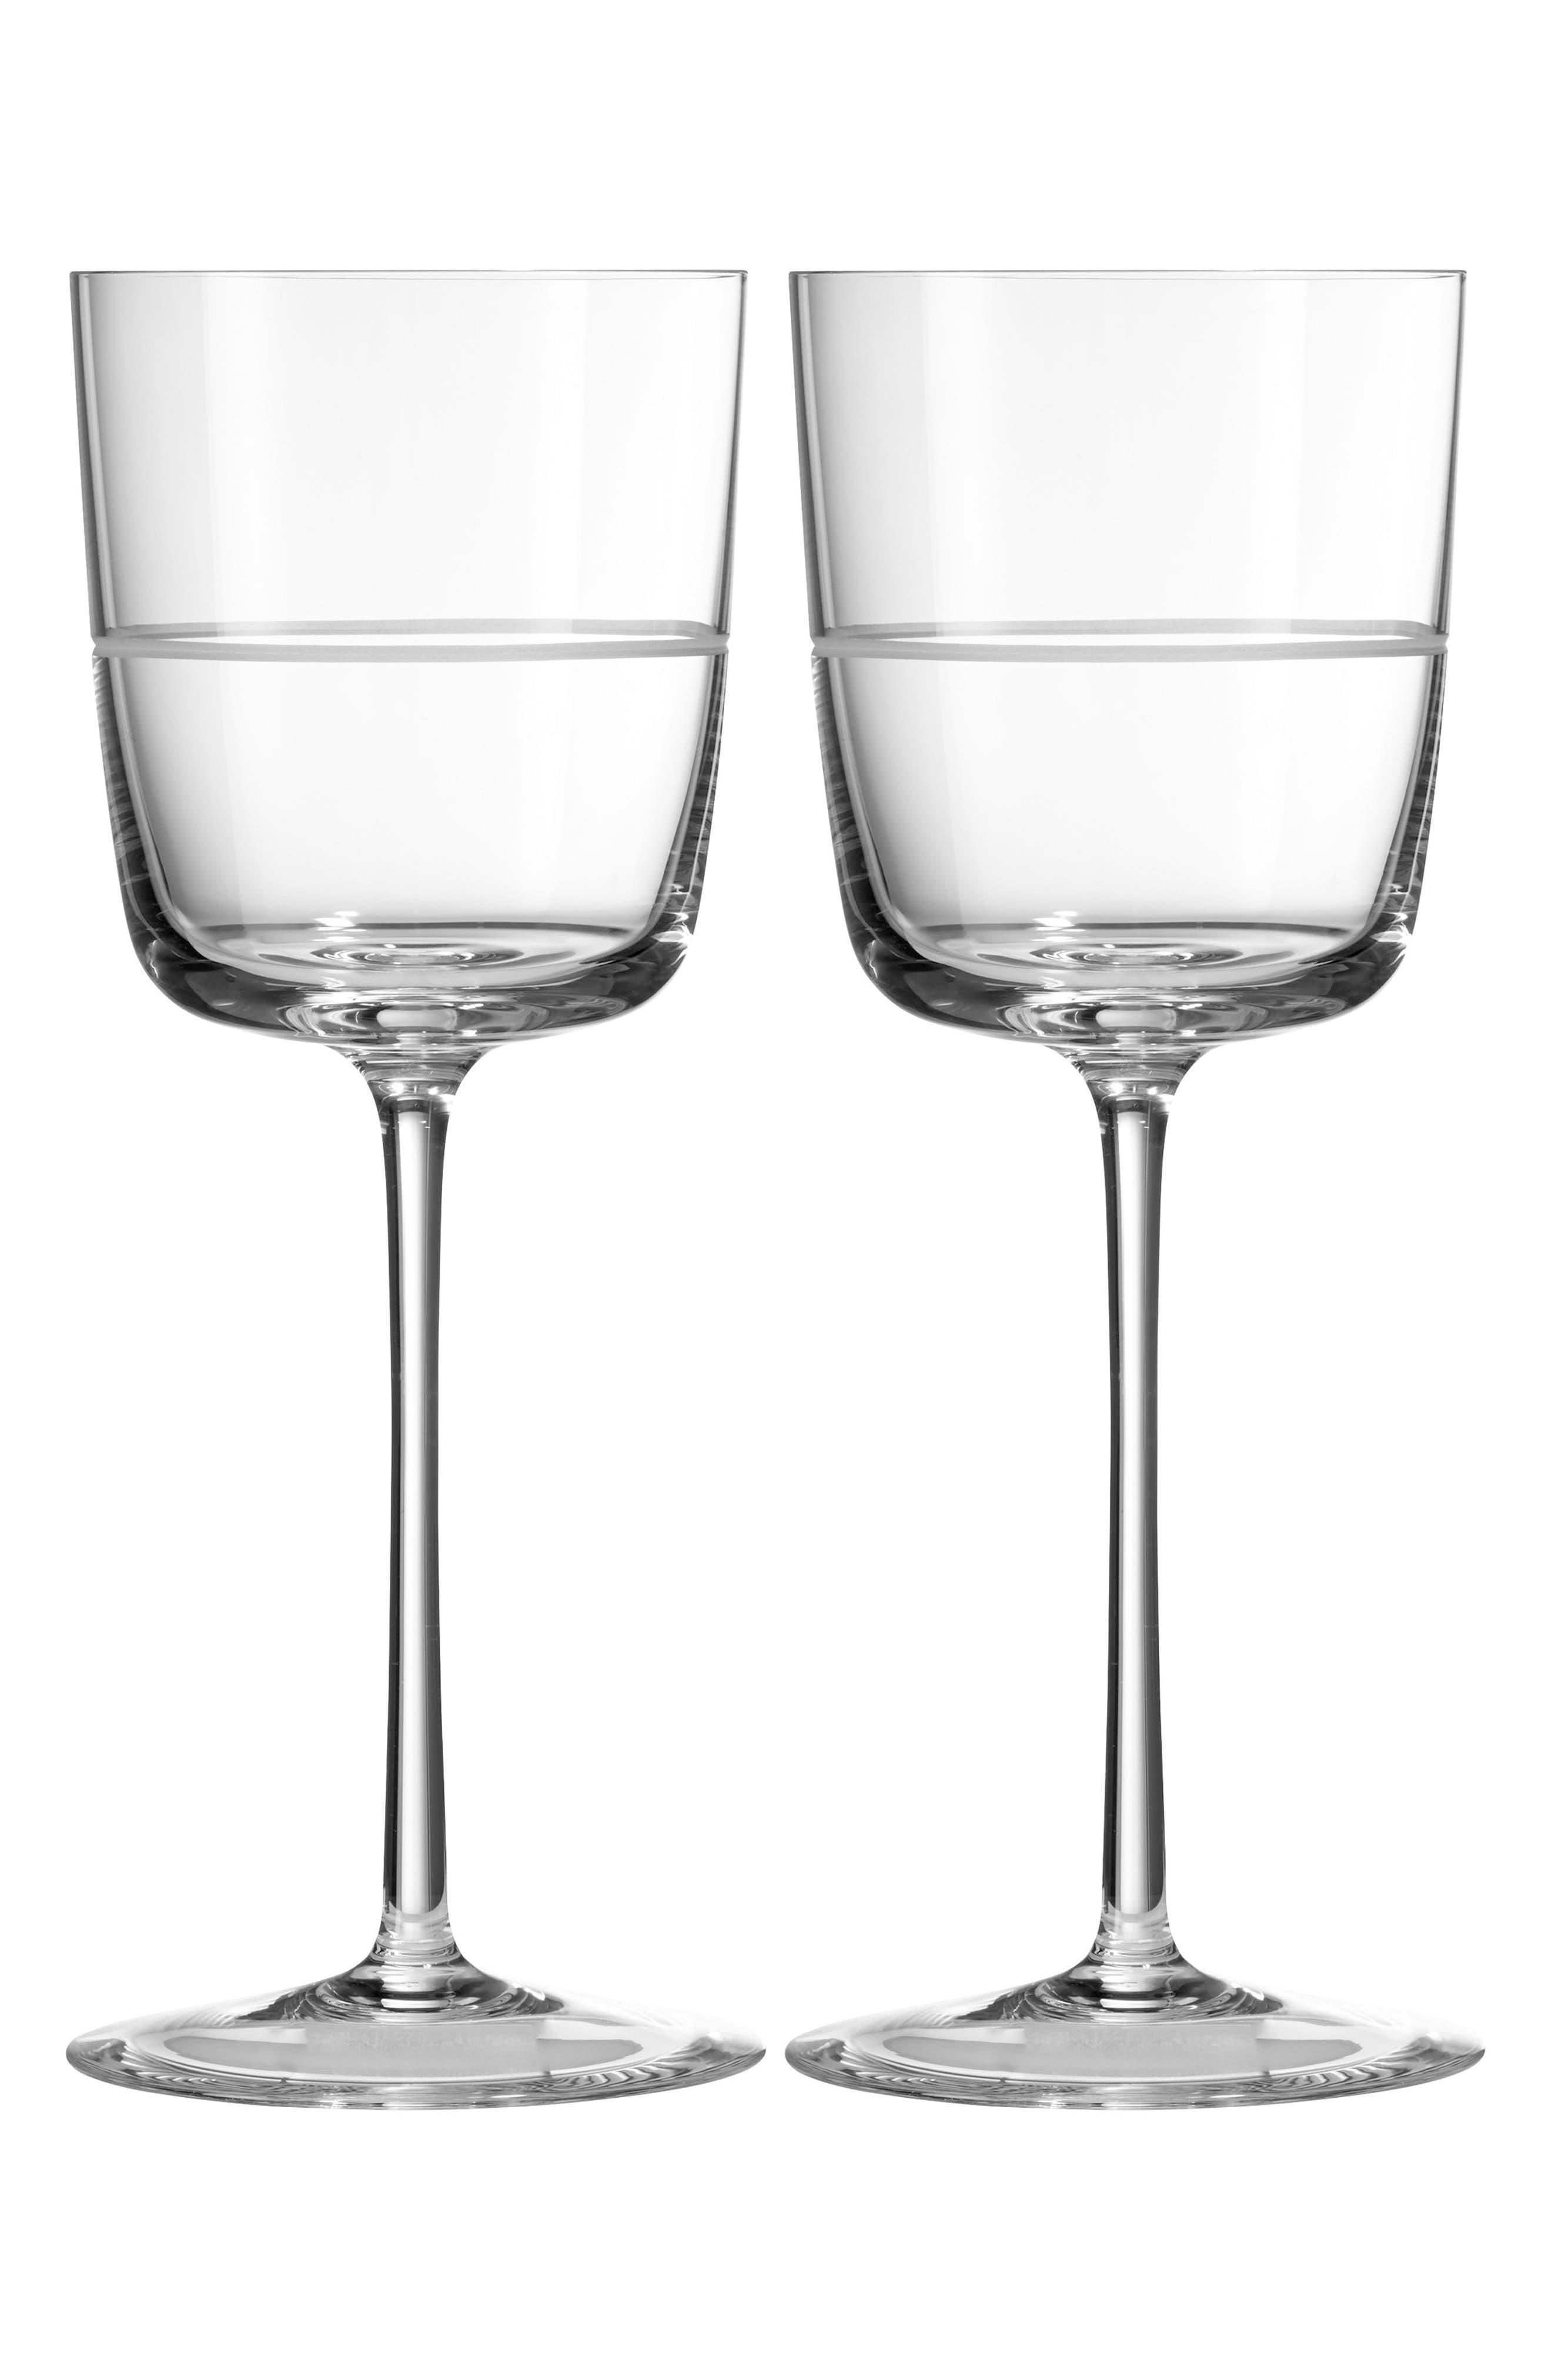 Main Image - Vera Wang x Wedgwood Vera Bande Set of 2 Wine Glasses